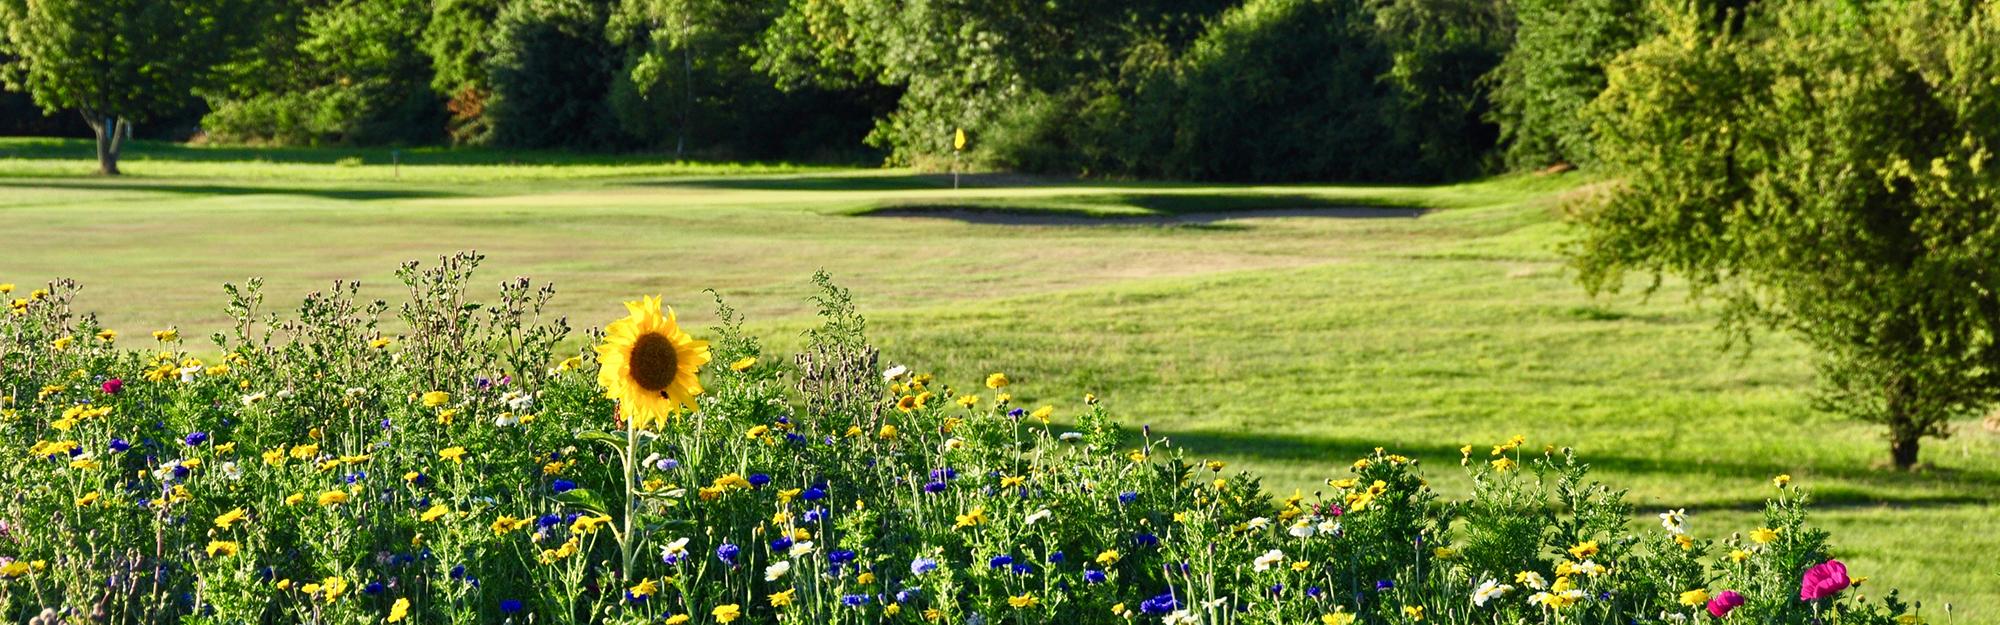 Natur Golfclub Castrop-Rauxel e.V.